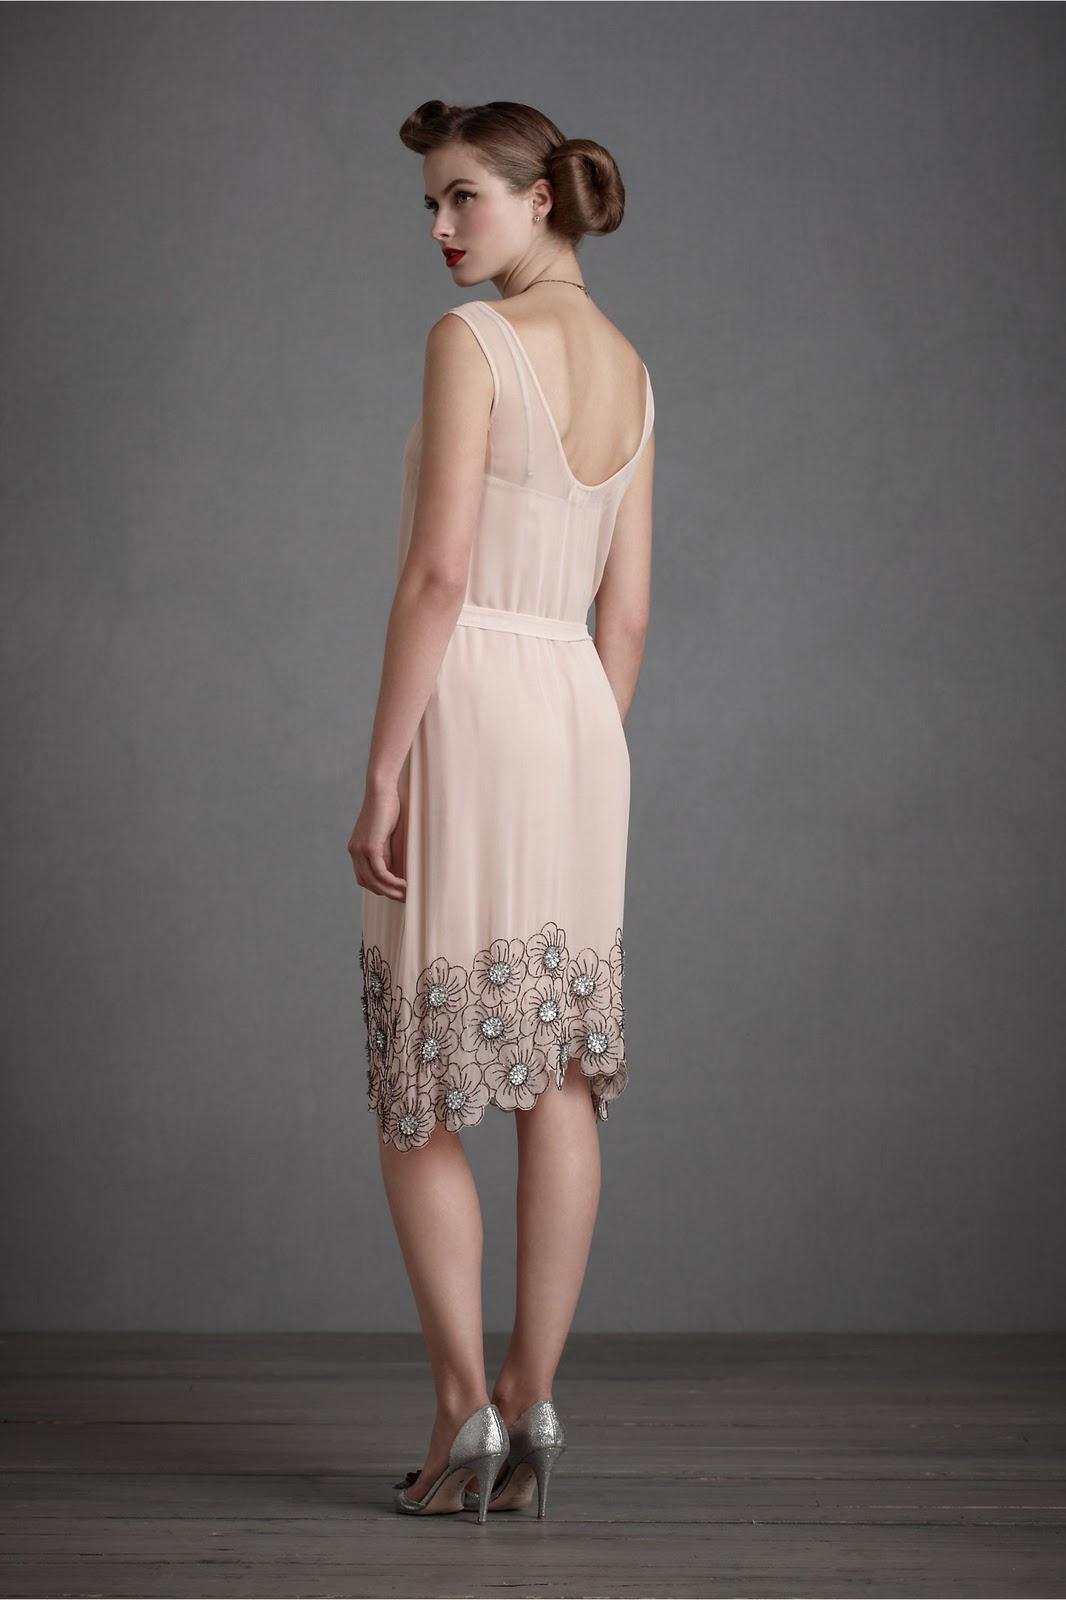 23064959 066 a - Boncuk ��lemeli Elbise Modeli